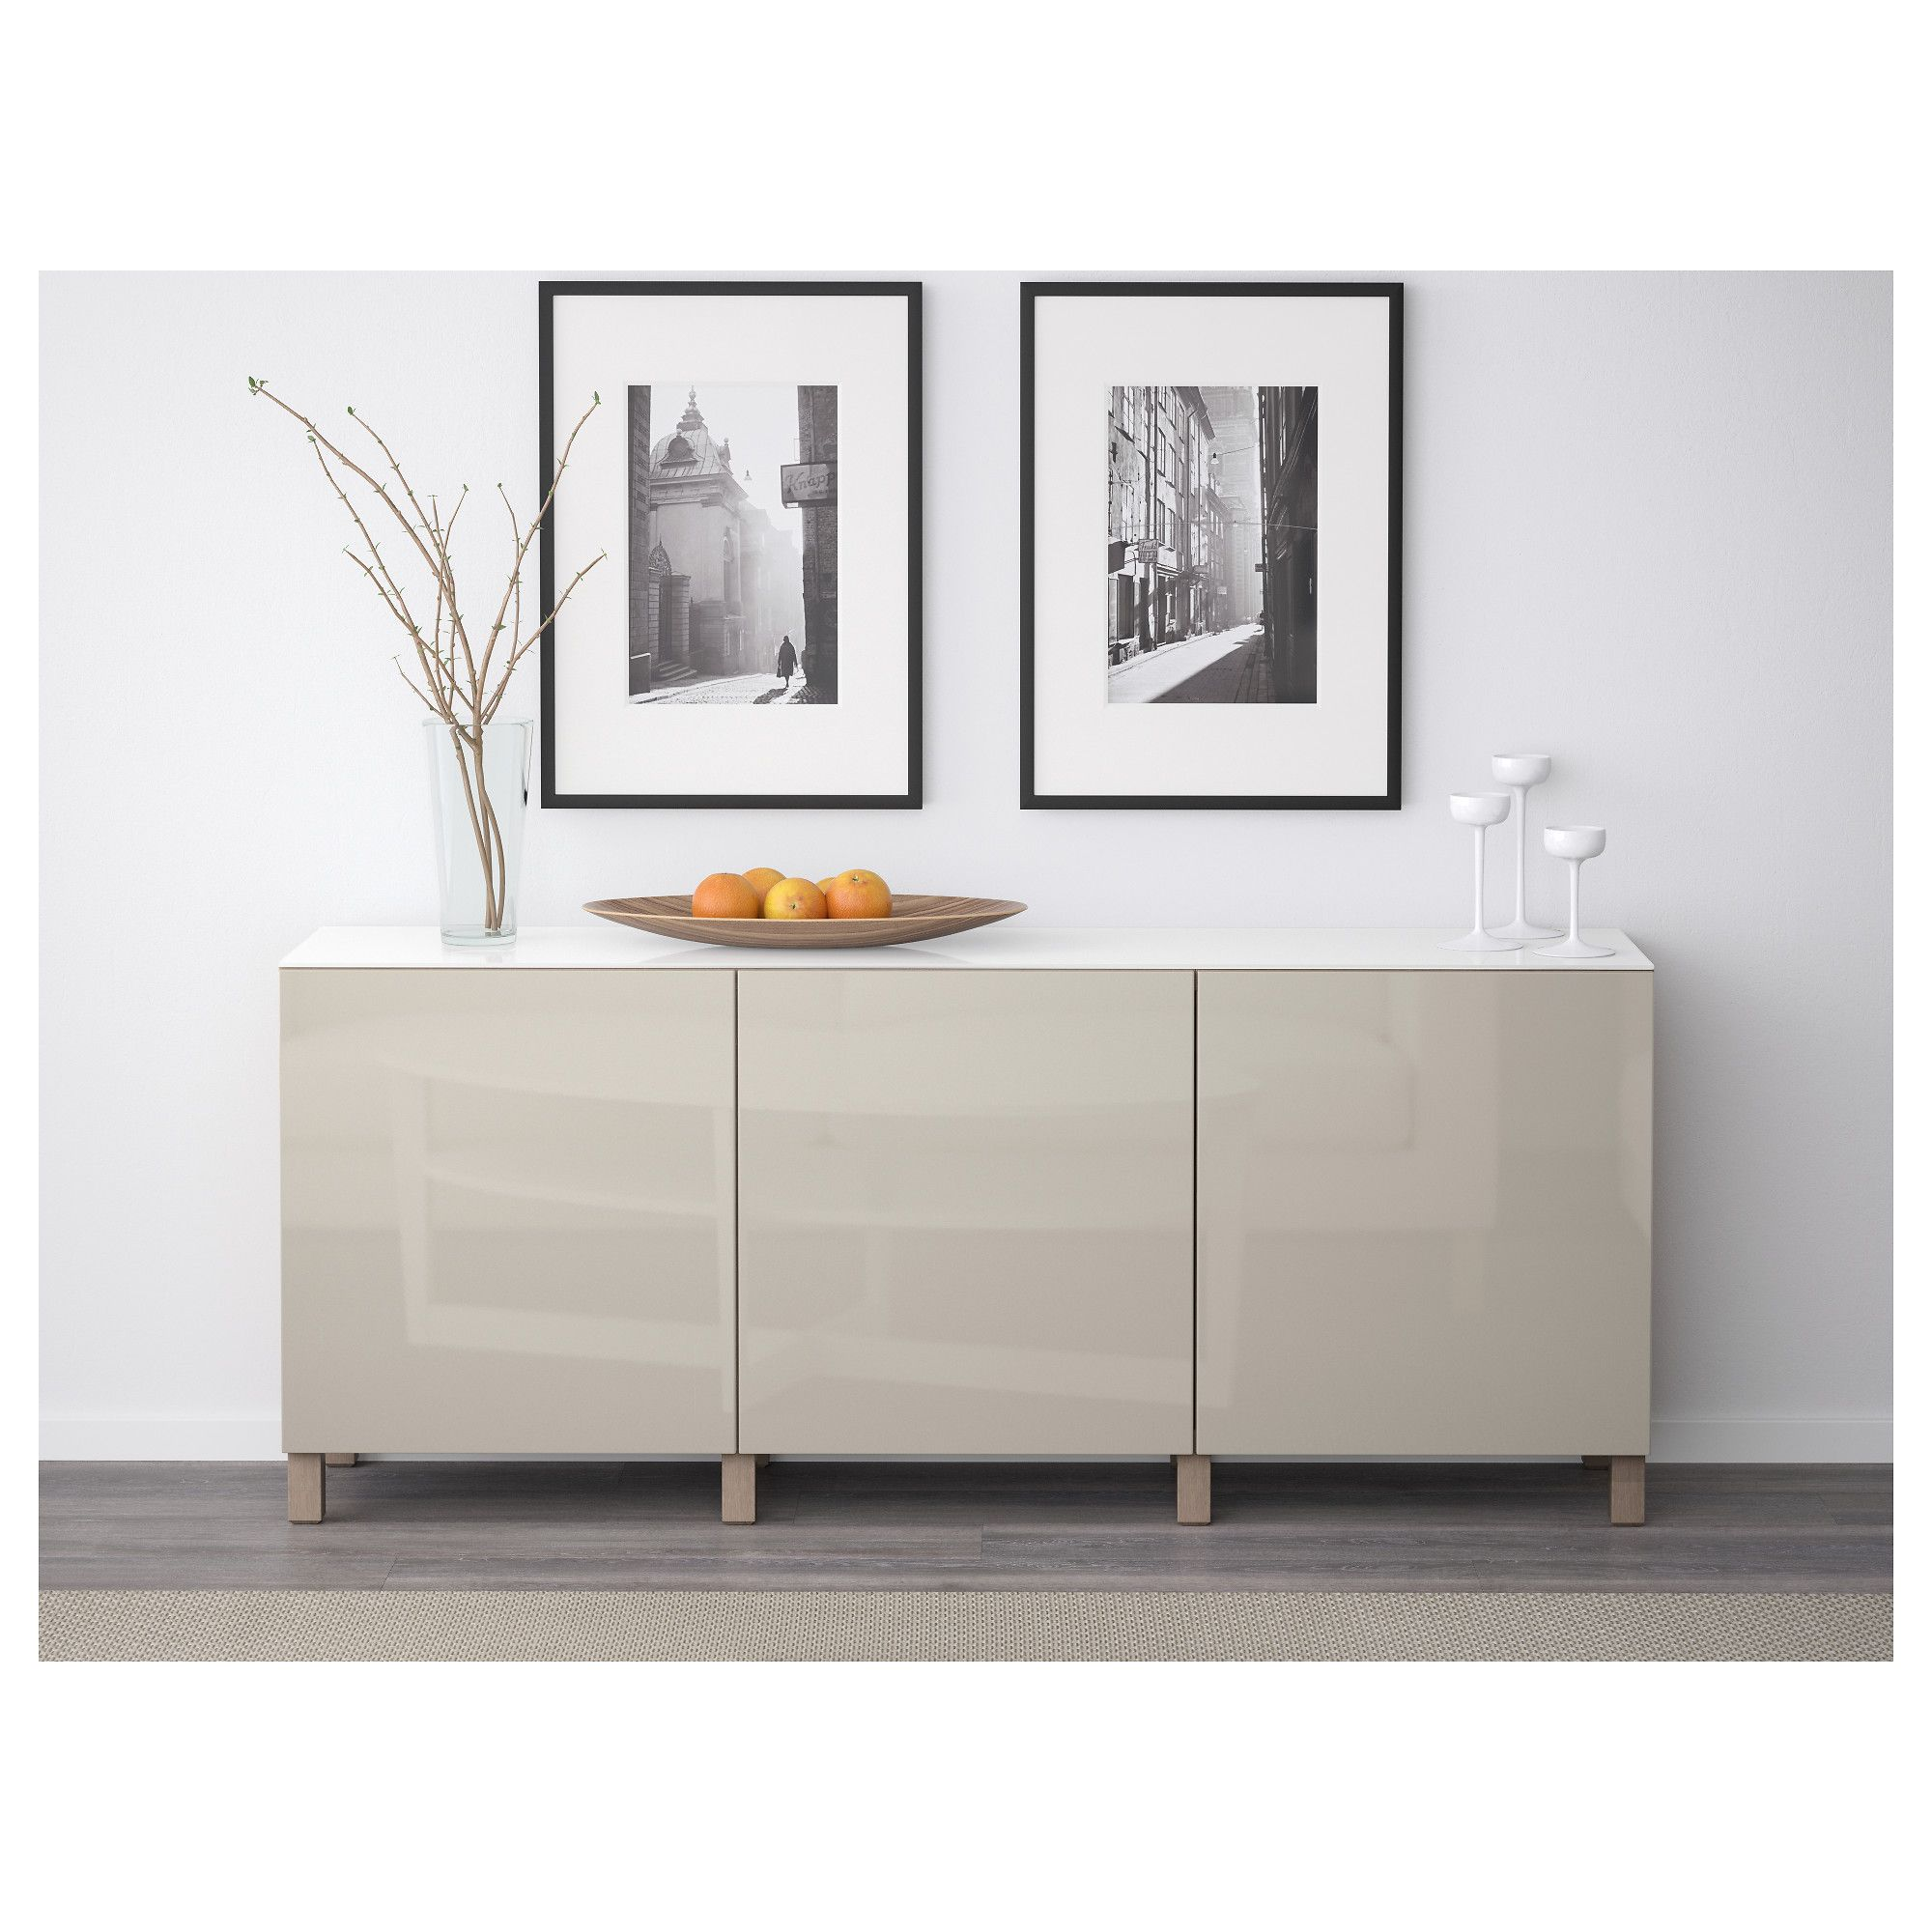 Storage combination with doors best walnut effect light - Walnut effect living room furniture ...